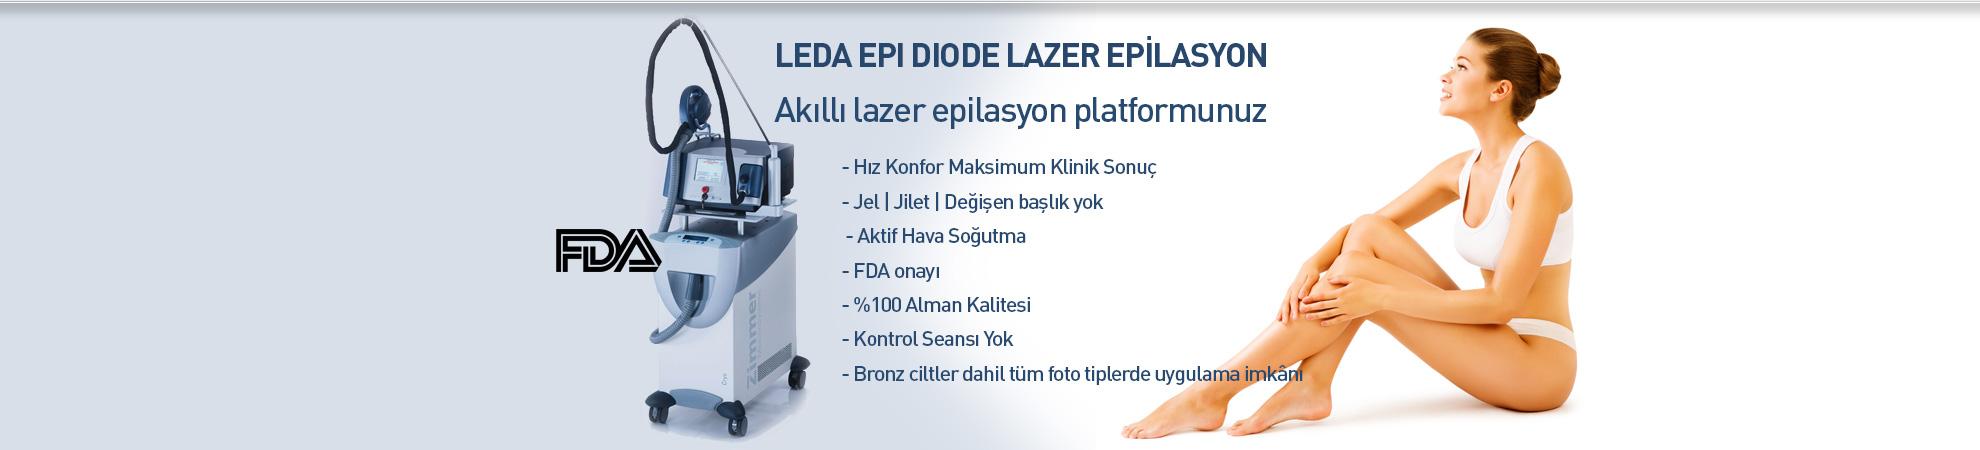 leda-epdiode-lazer